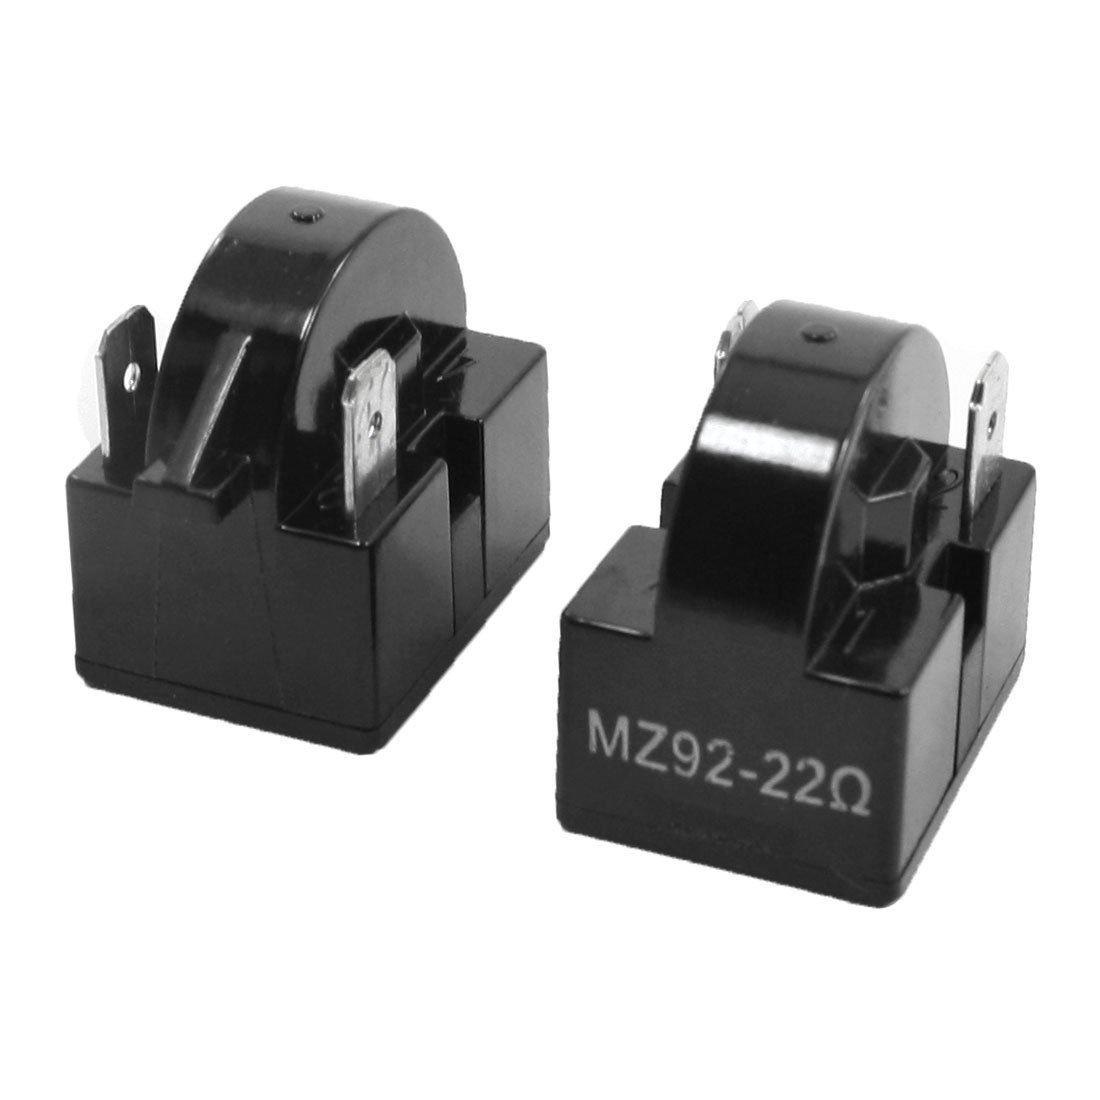 2Pcs MZ92 22 Ohm 2 Terminals PTC Starter Relays for Refrigerator ;TM79F-32M UGBA49830